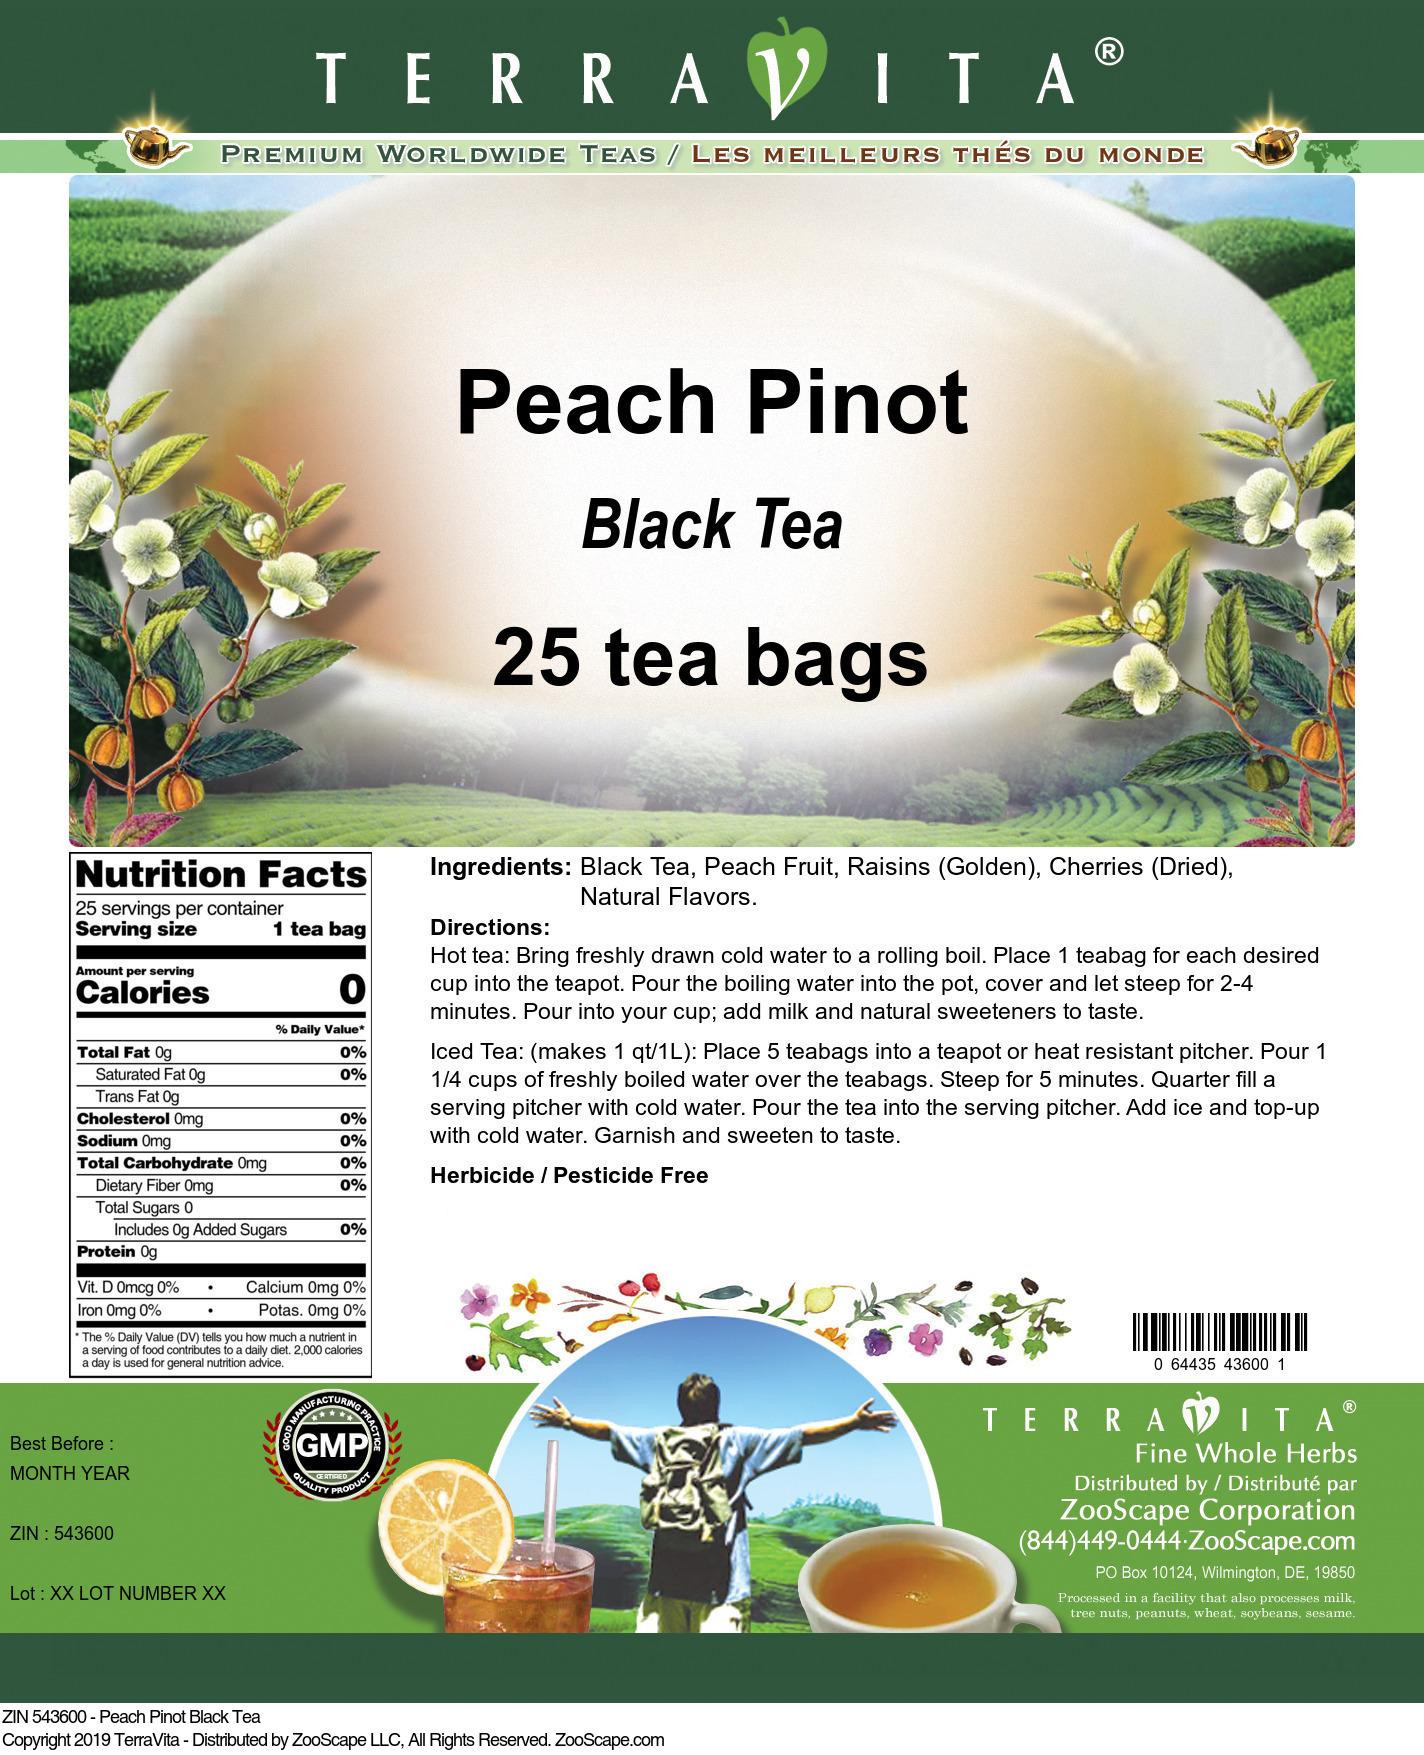 Peach Pinot Black Tea